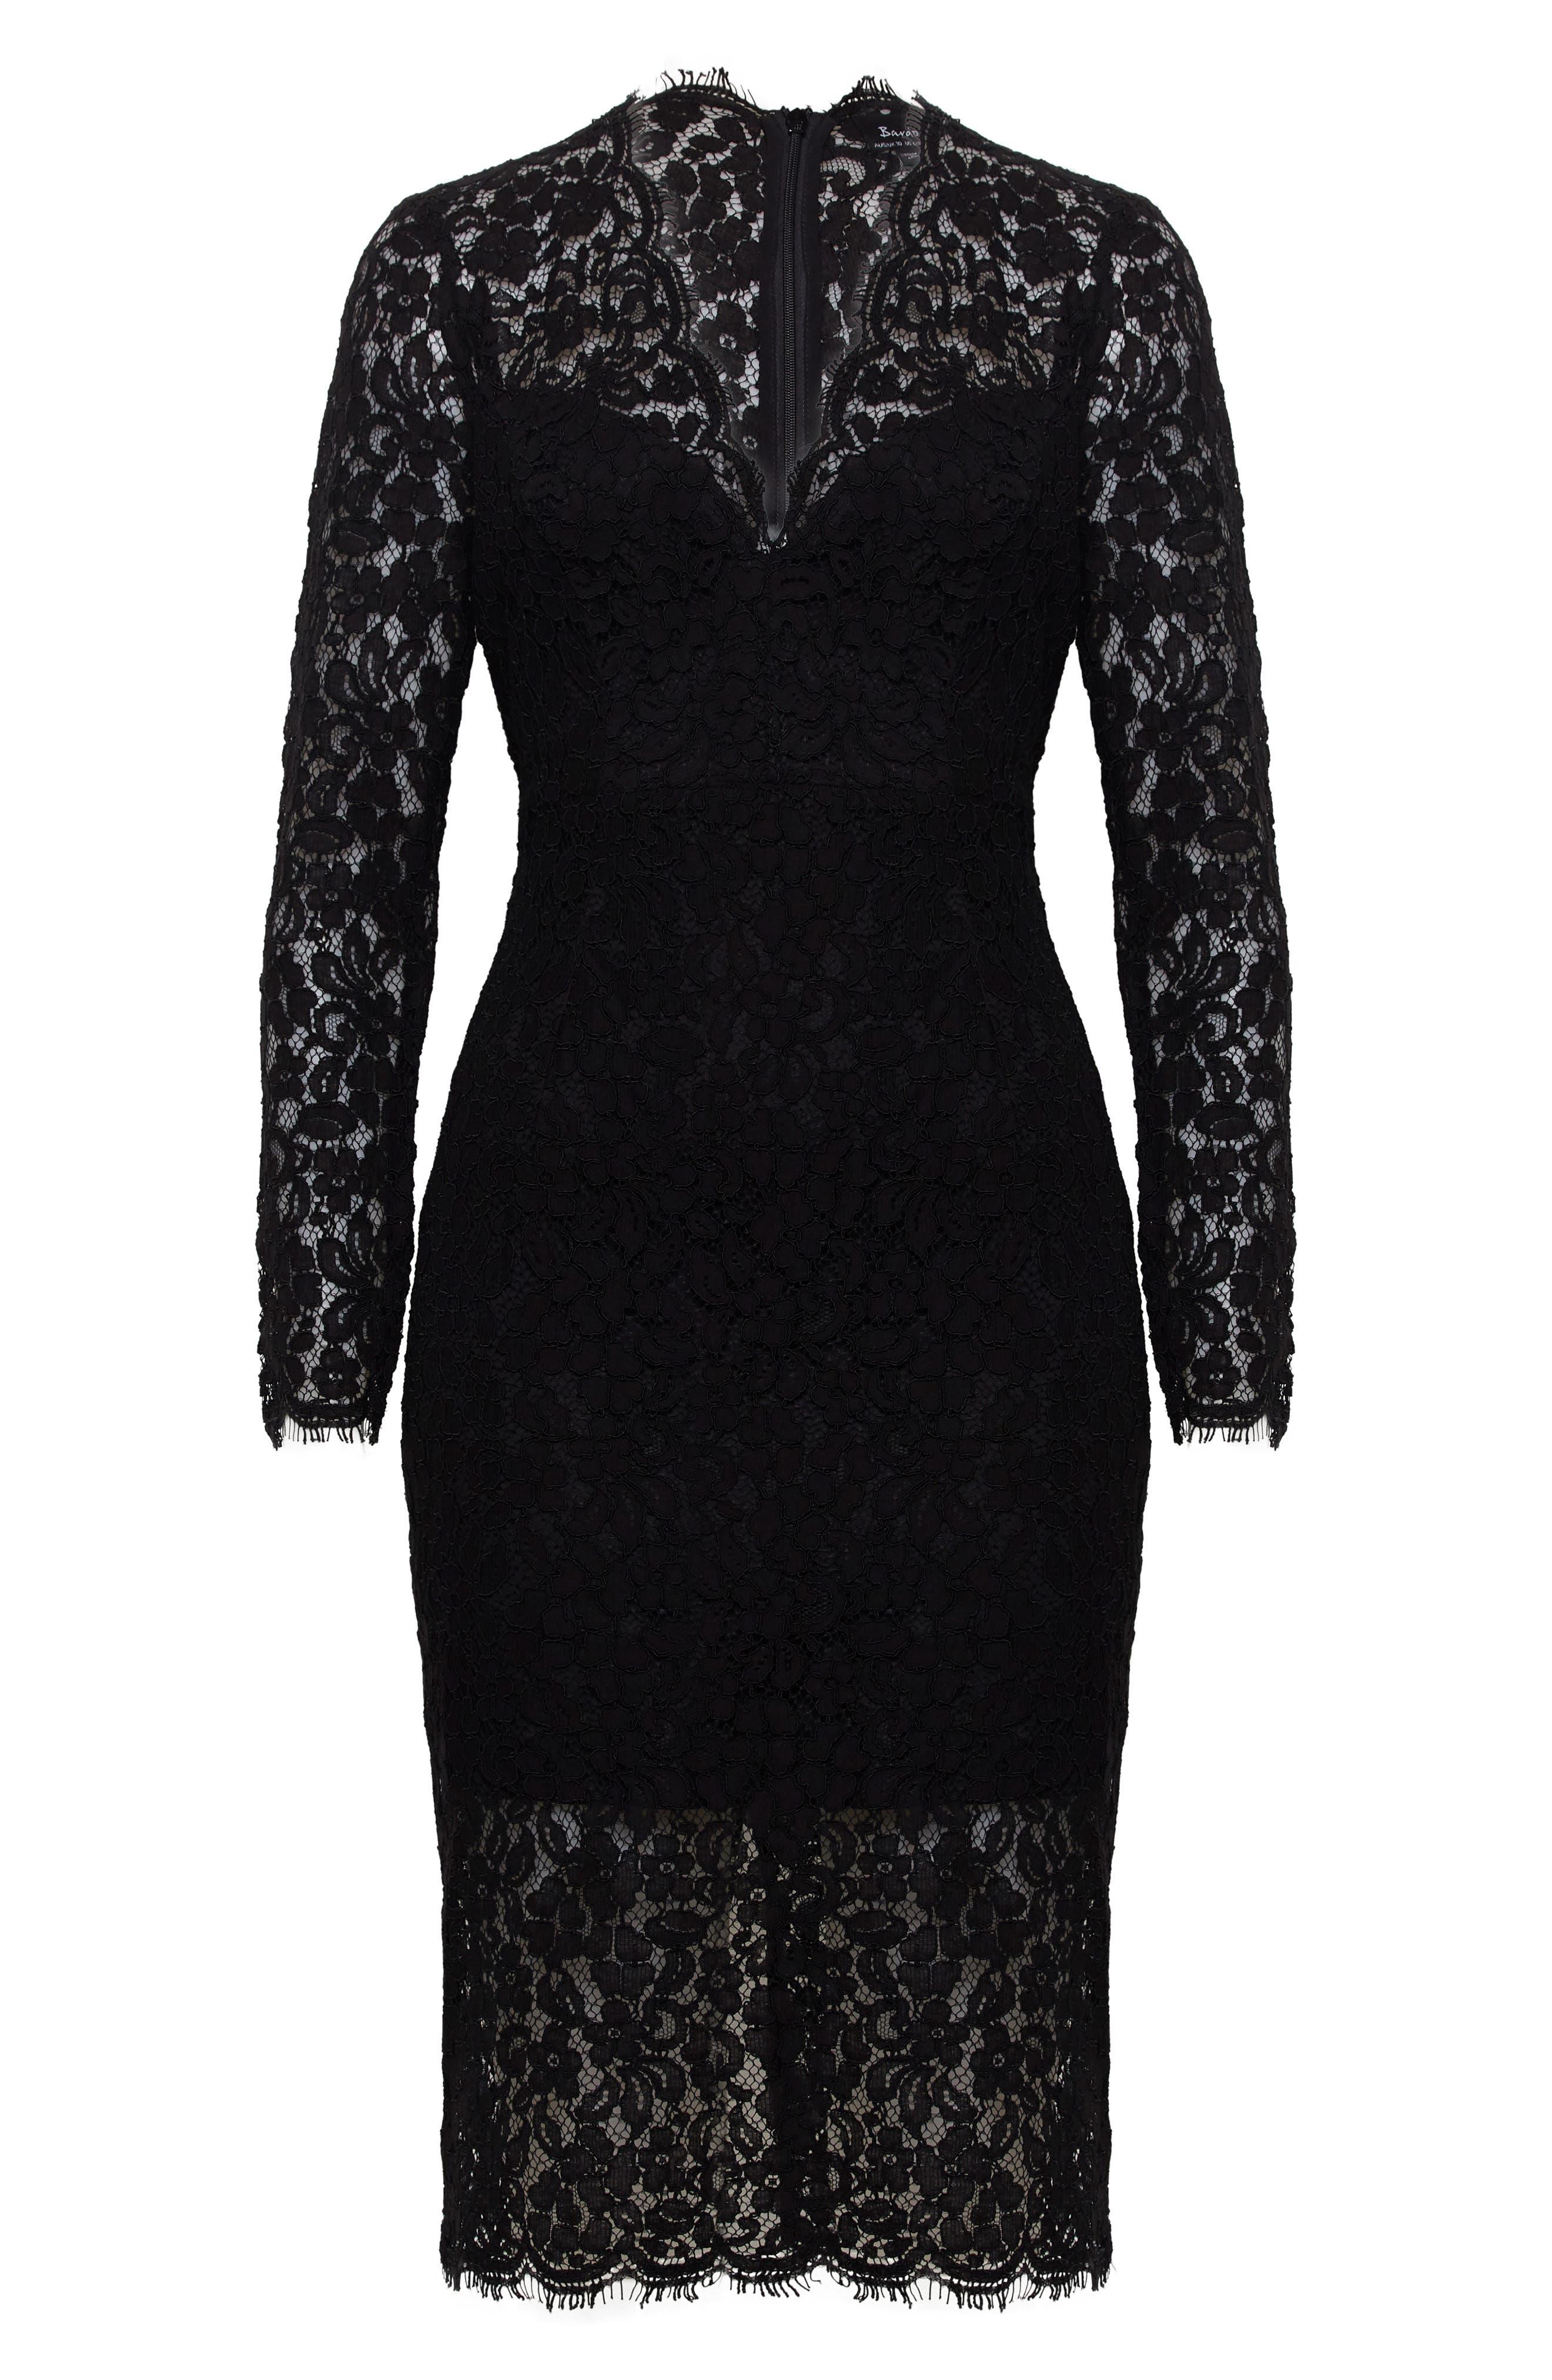 BARDOT,                             Midnights Lace Dress,                             Alternate thumbnail 6, color,                             BLACK